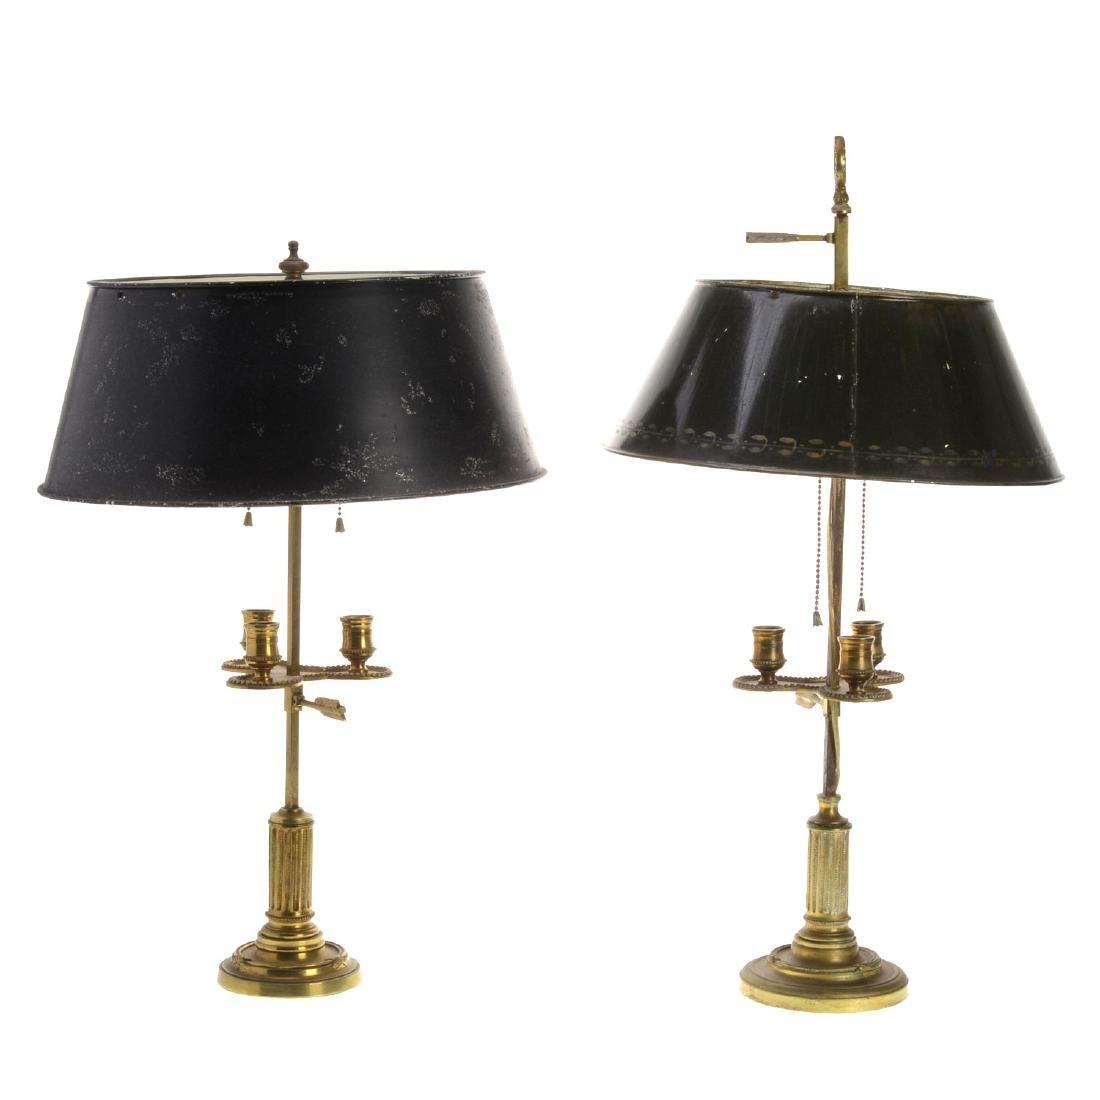 Near pair Louis XVI style brass bouillotte lamps